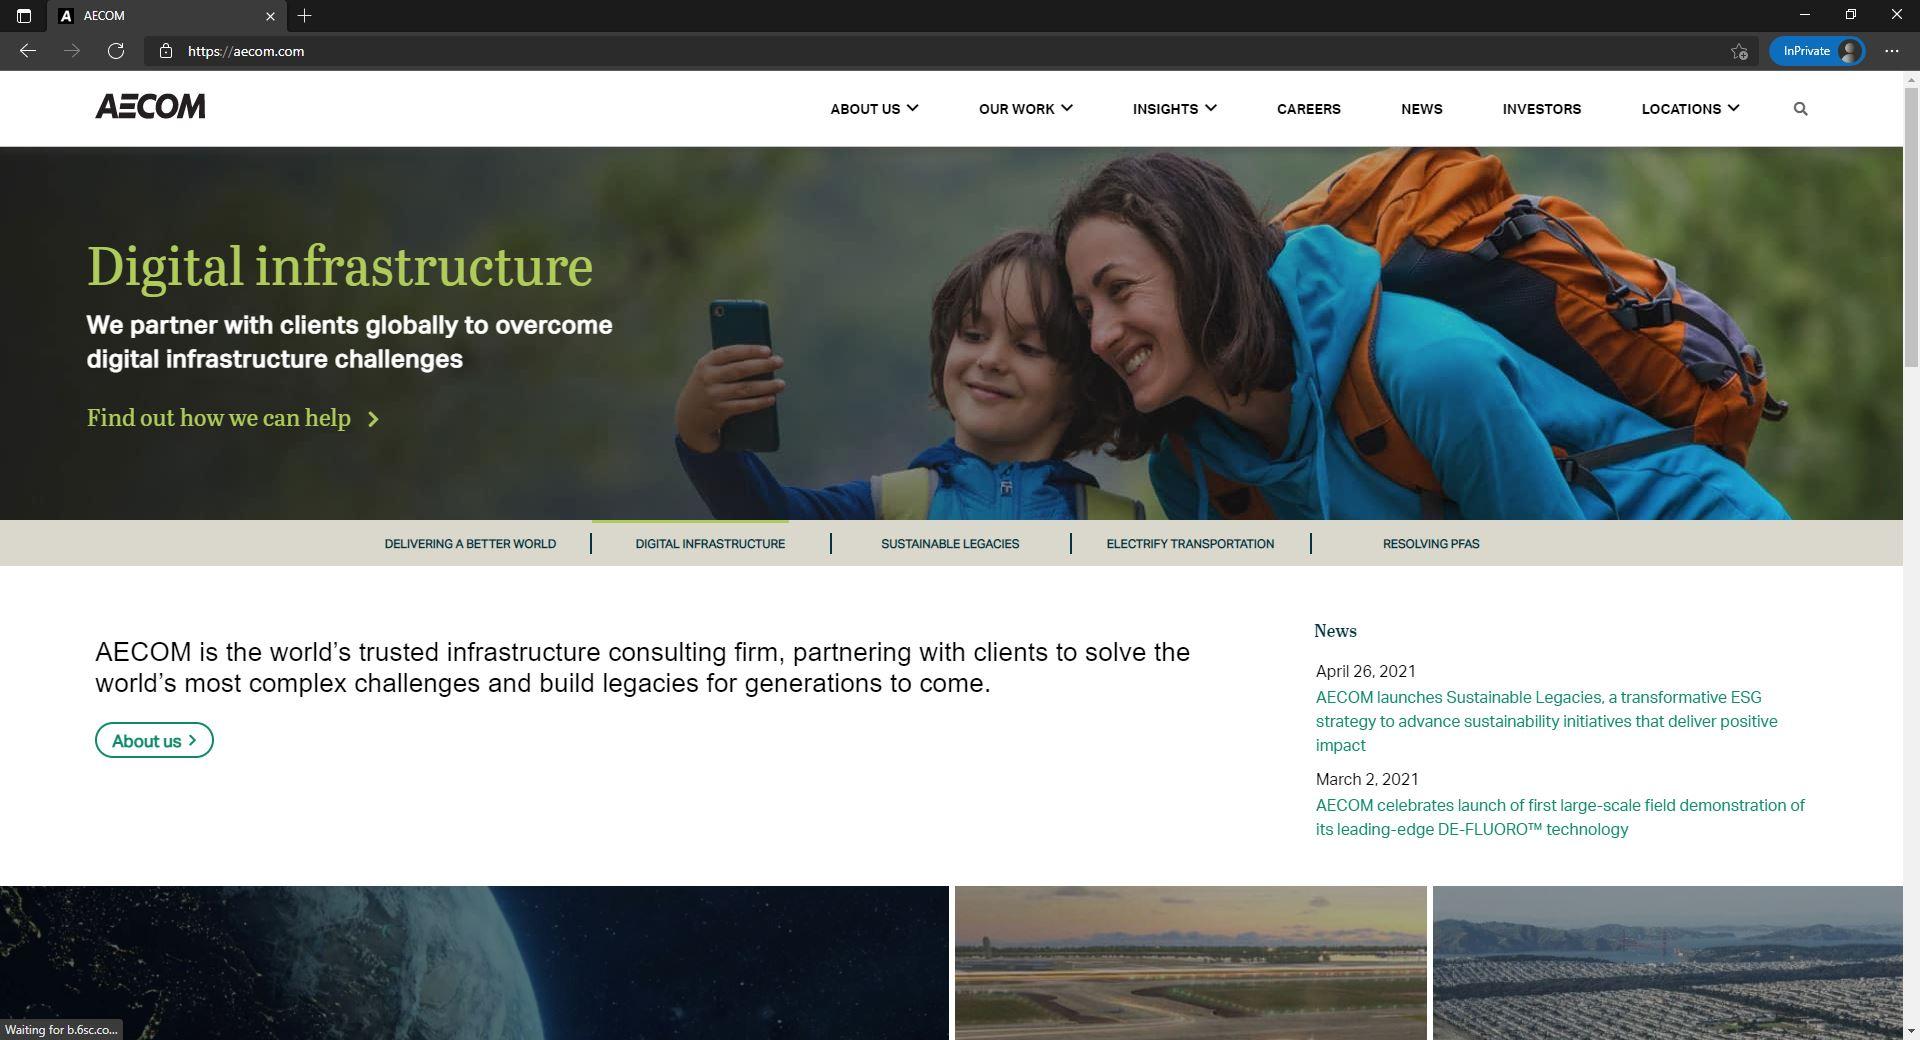 AECOM website homepage